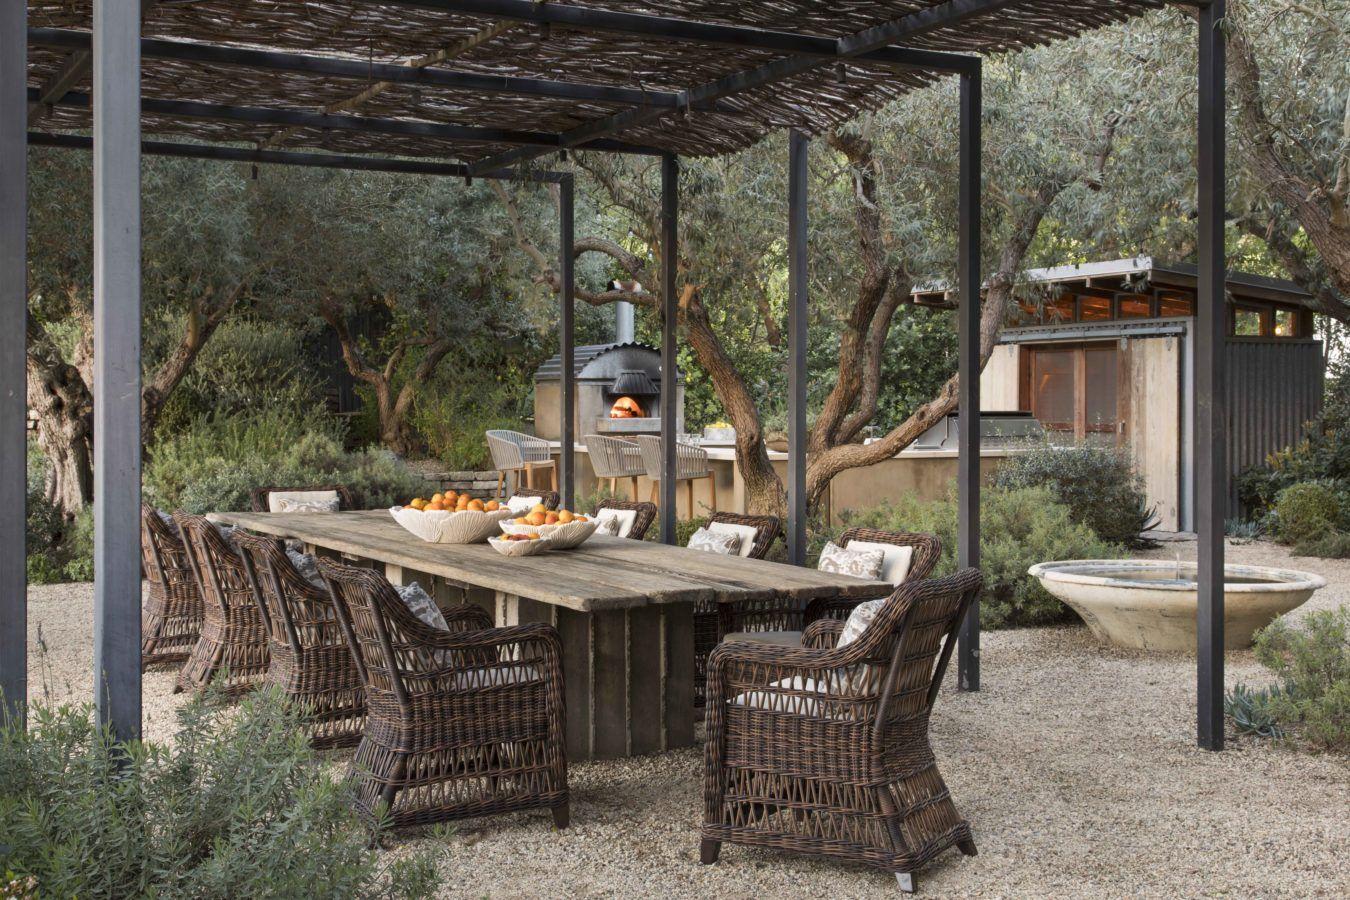 Landscape Architect Scott Shrader Shares His Garden Design Philosophy And His New Book Garden Design Landscape Architect Garden Landscape Design